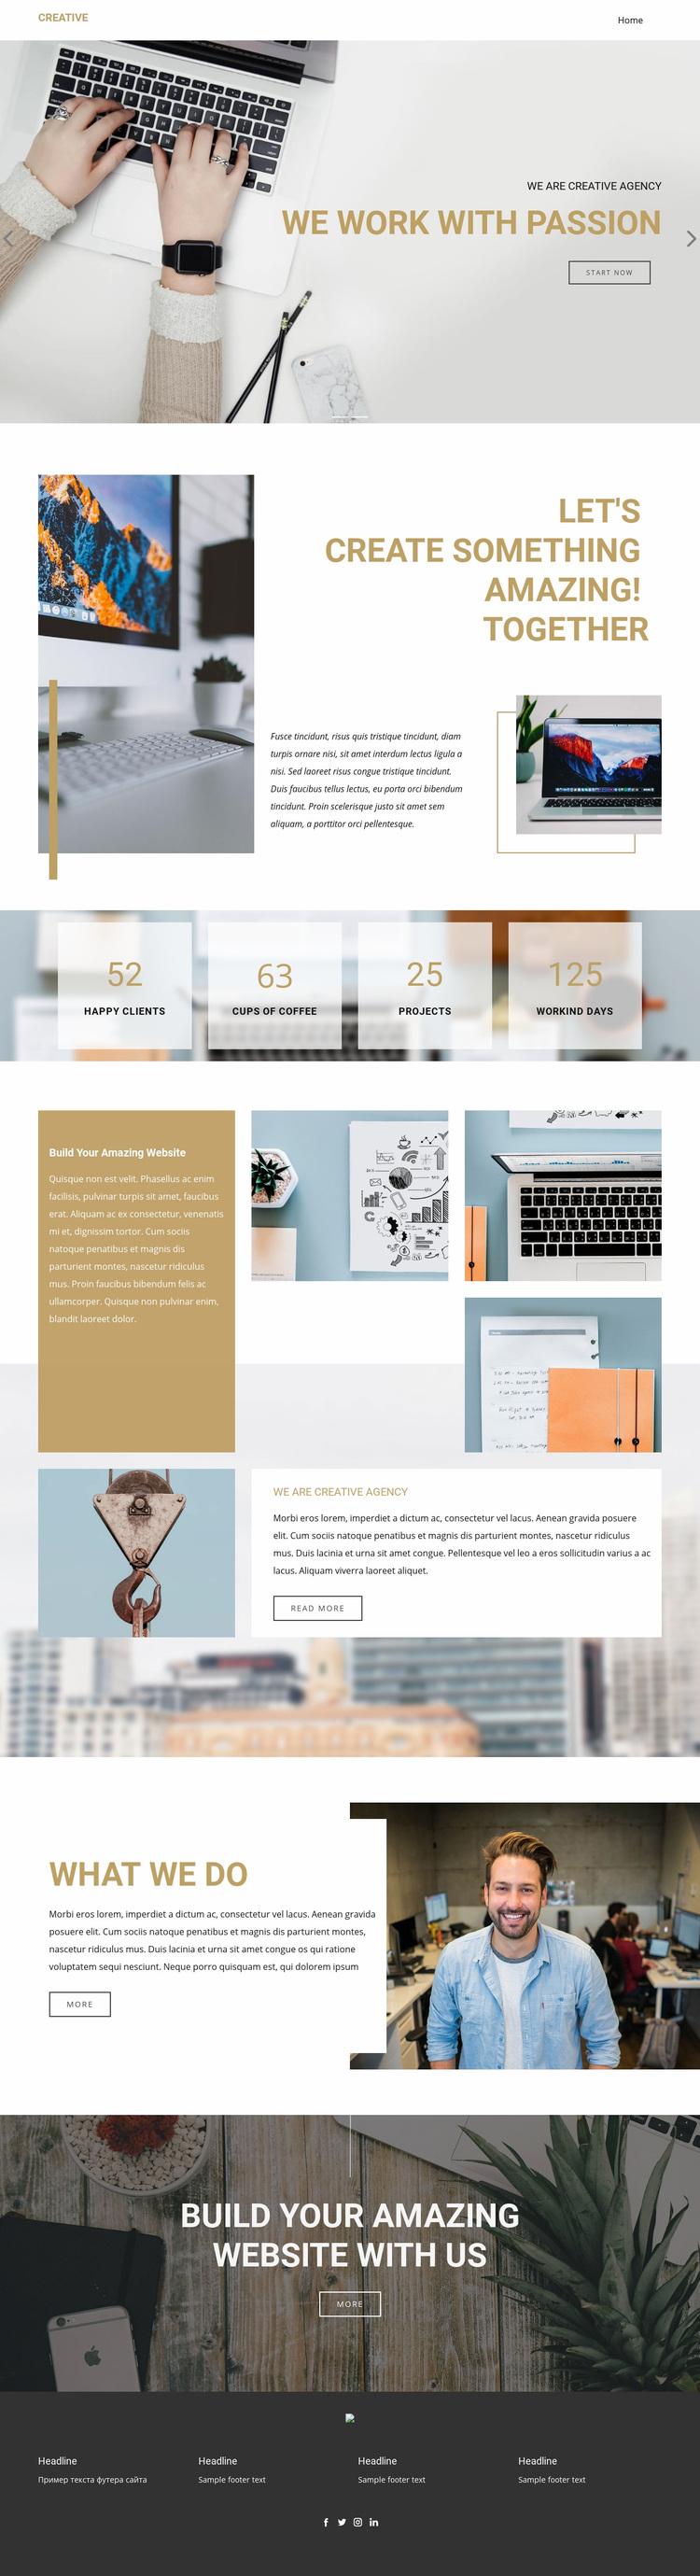 Exceptional creative designs Web Page Designer